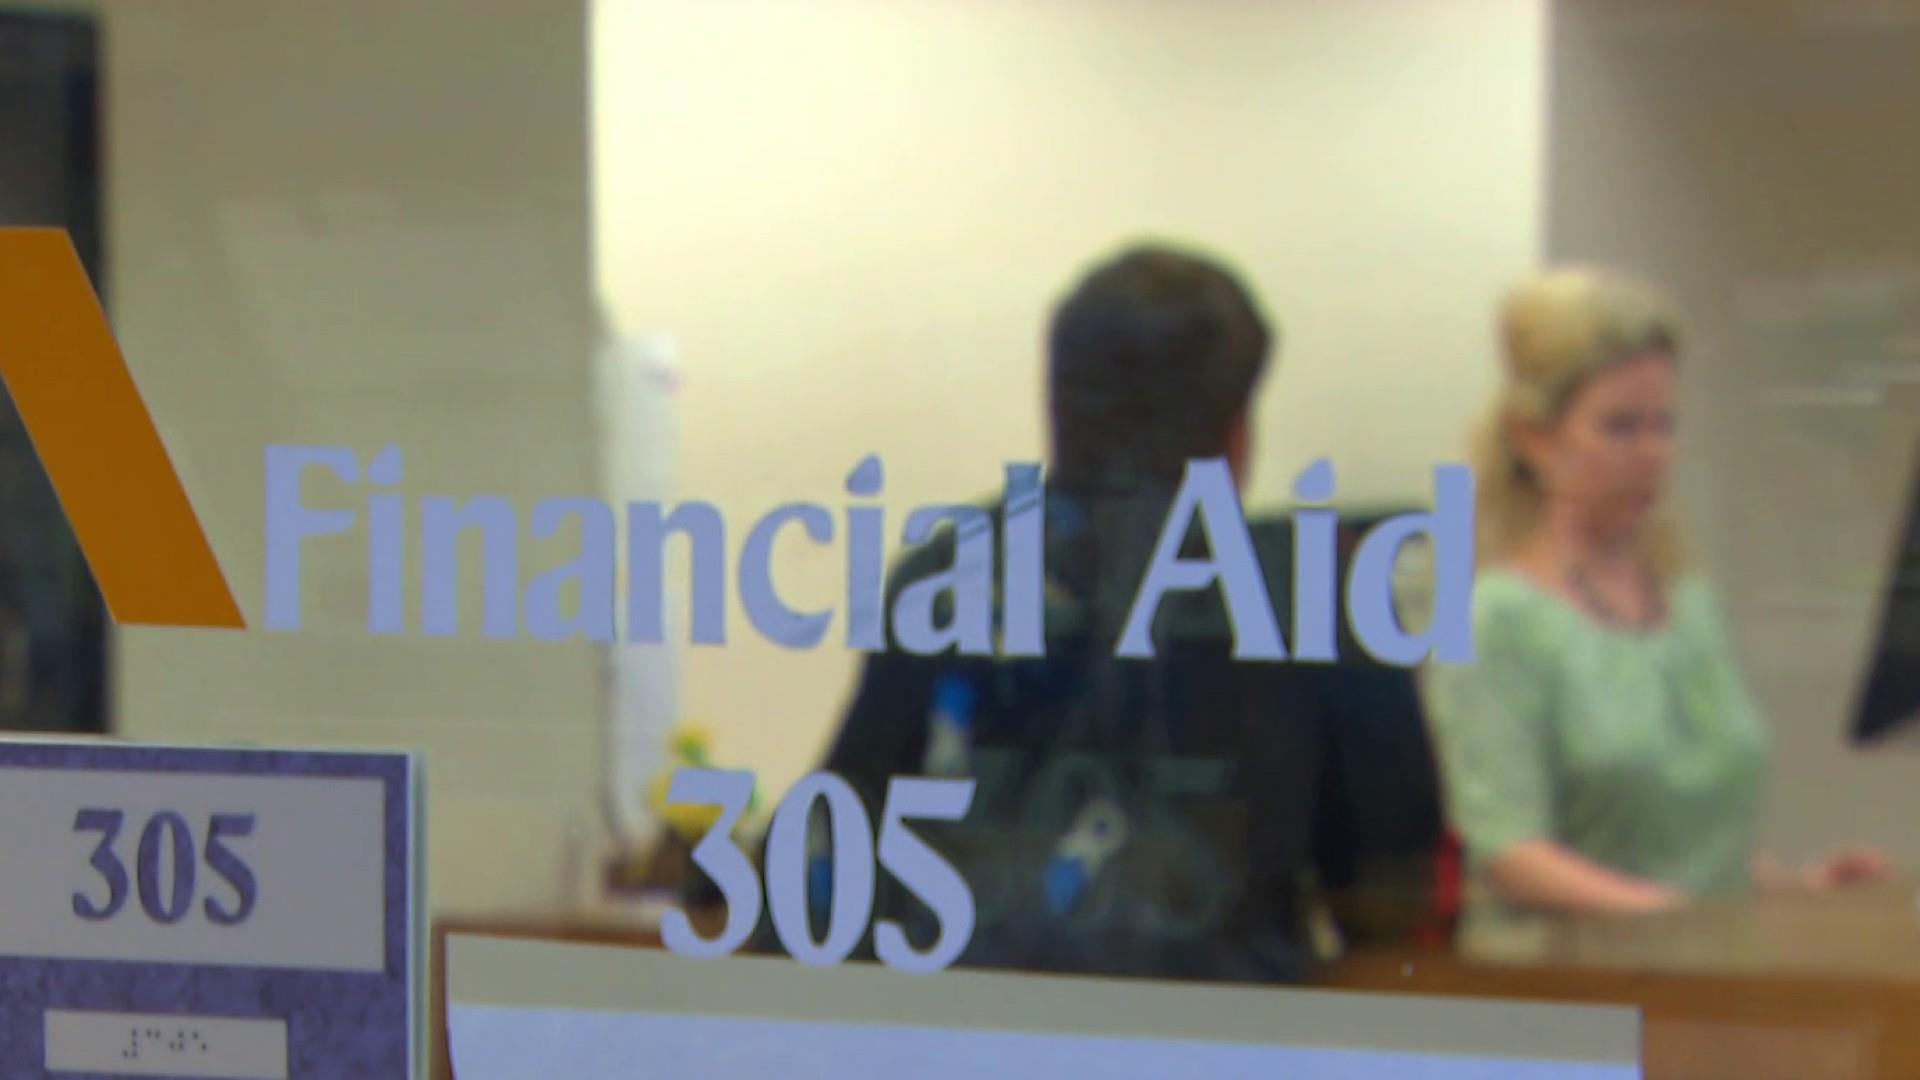 Student loan lender Sallie Mae executives enjoy lavish vacation as millions struggle to pay off debt